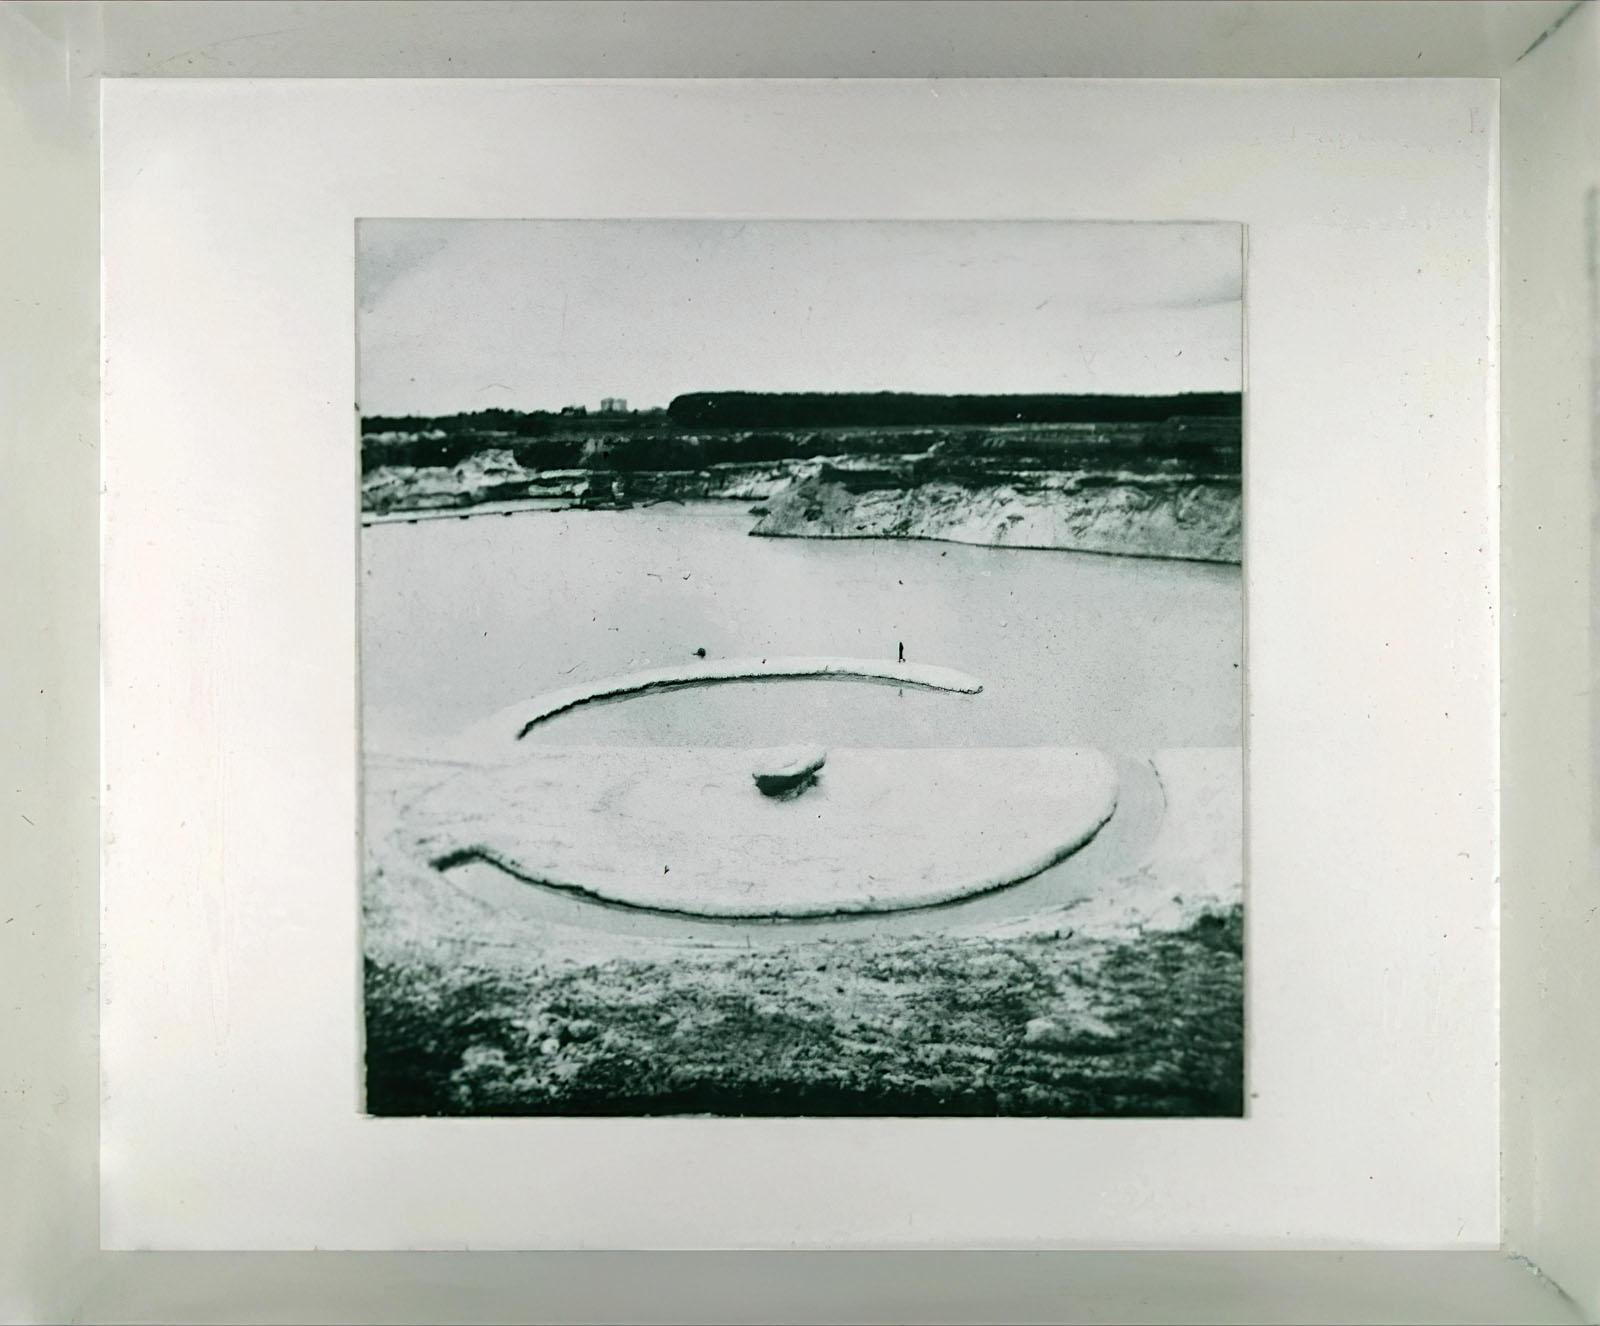 Robert Smithson - Broken Circle